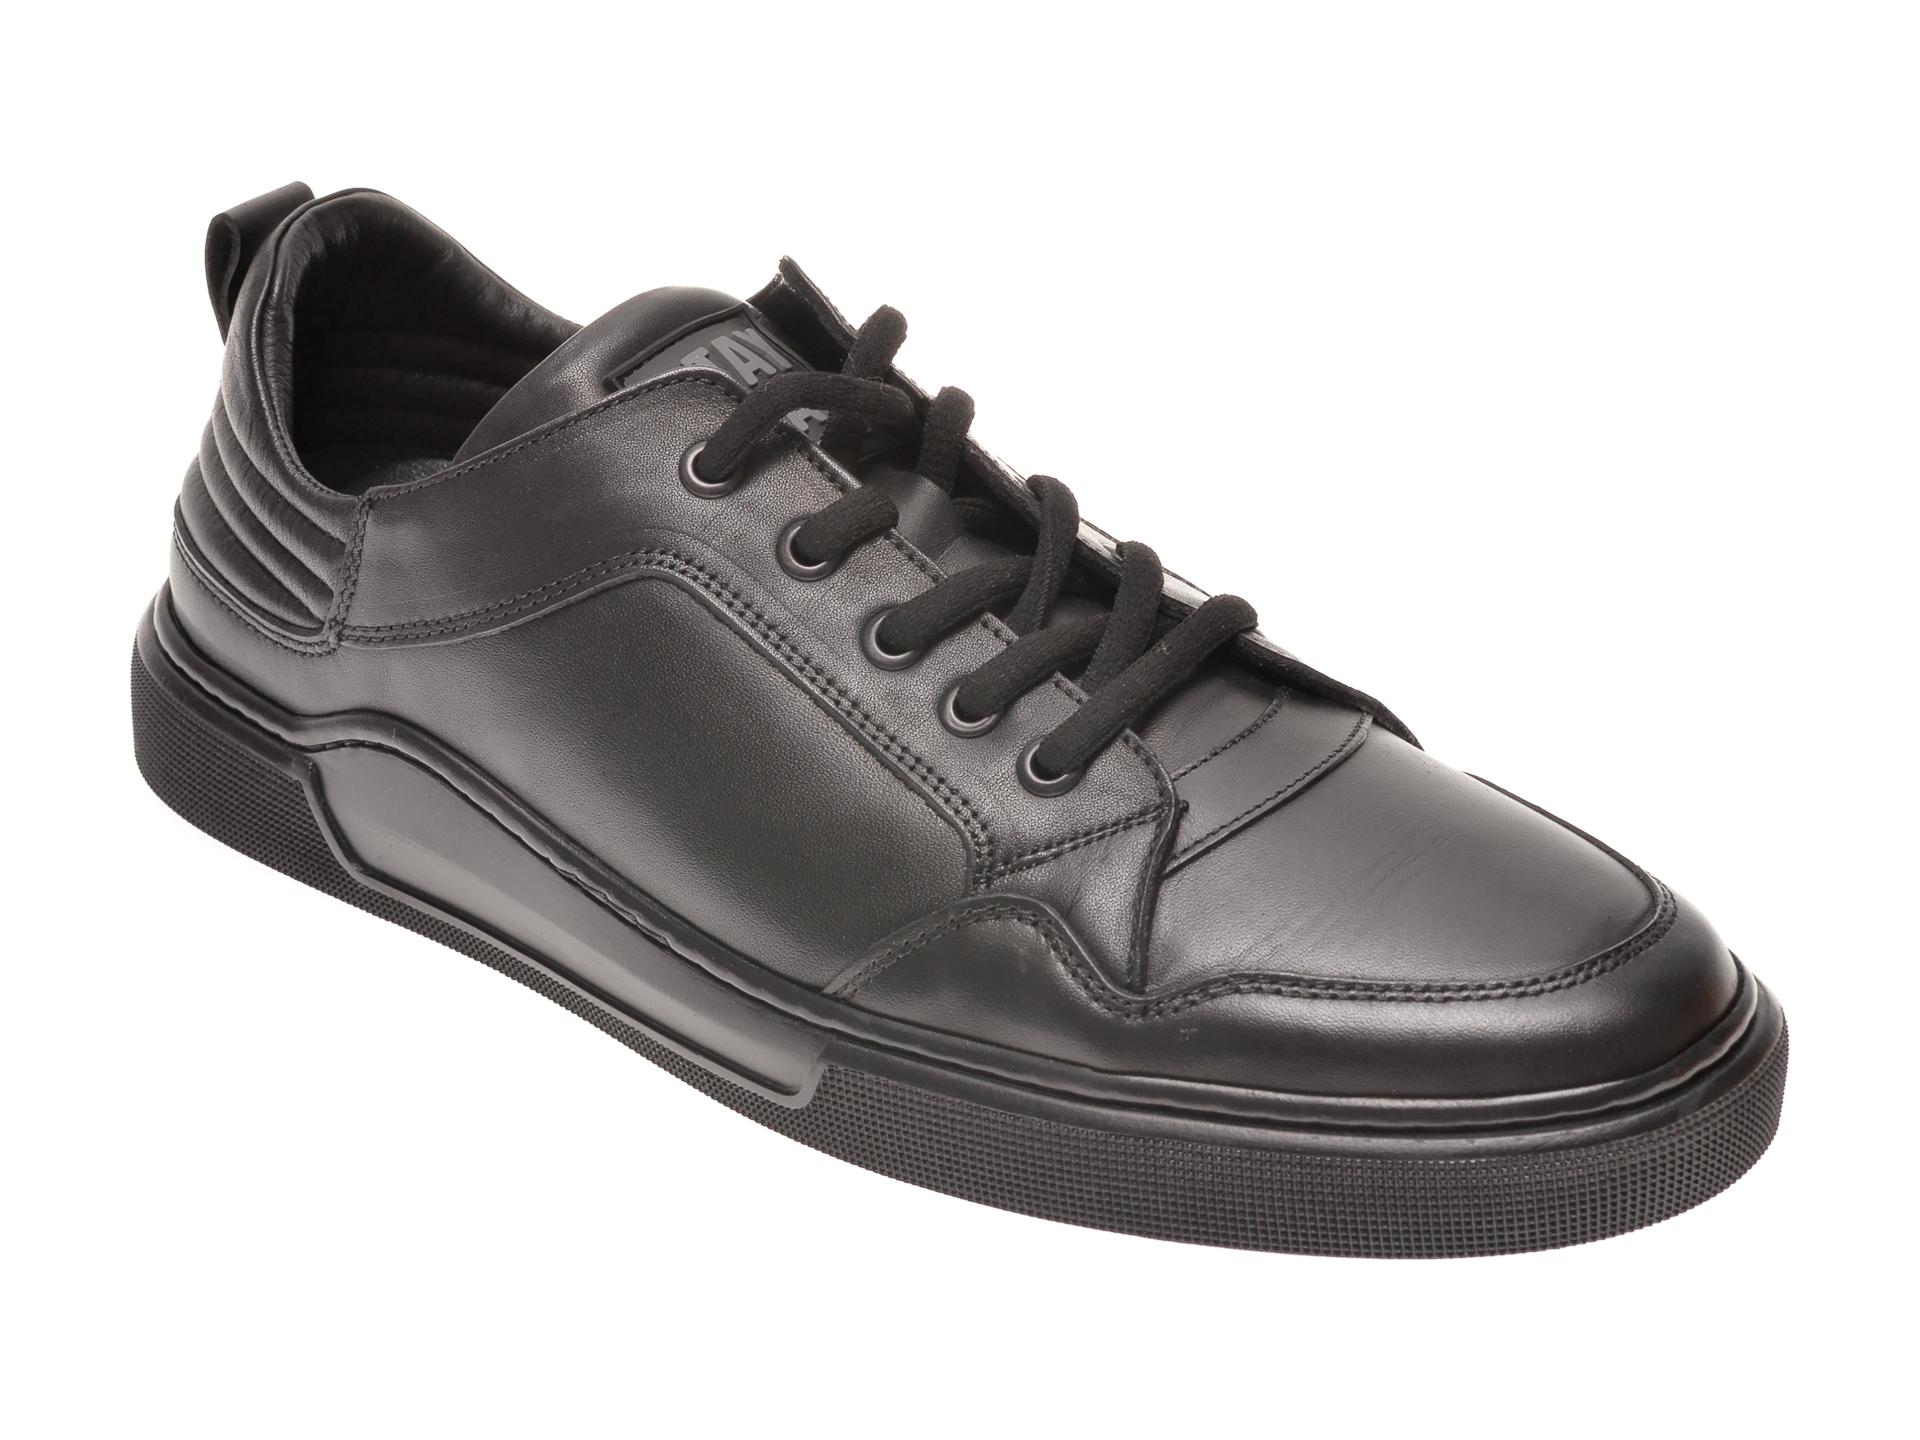 Pantofi OTTER negri, 48709, din piele naturala New